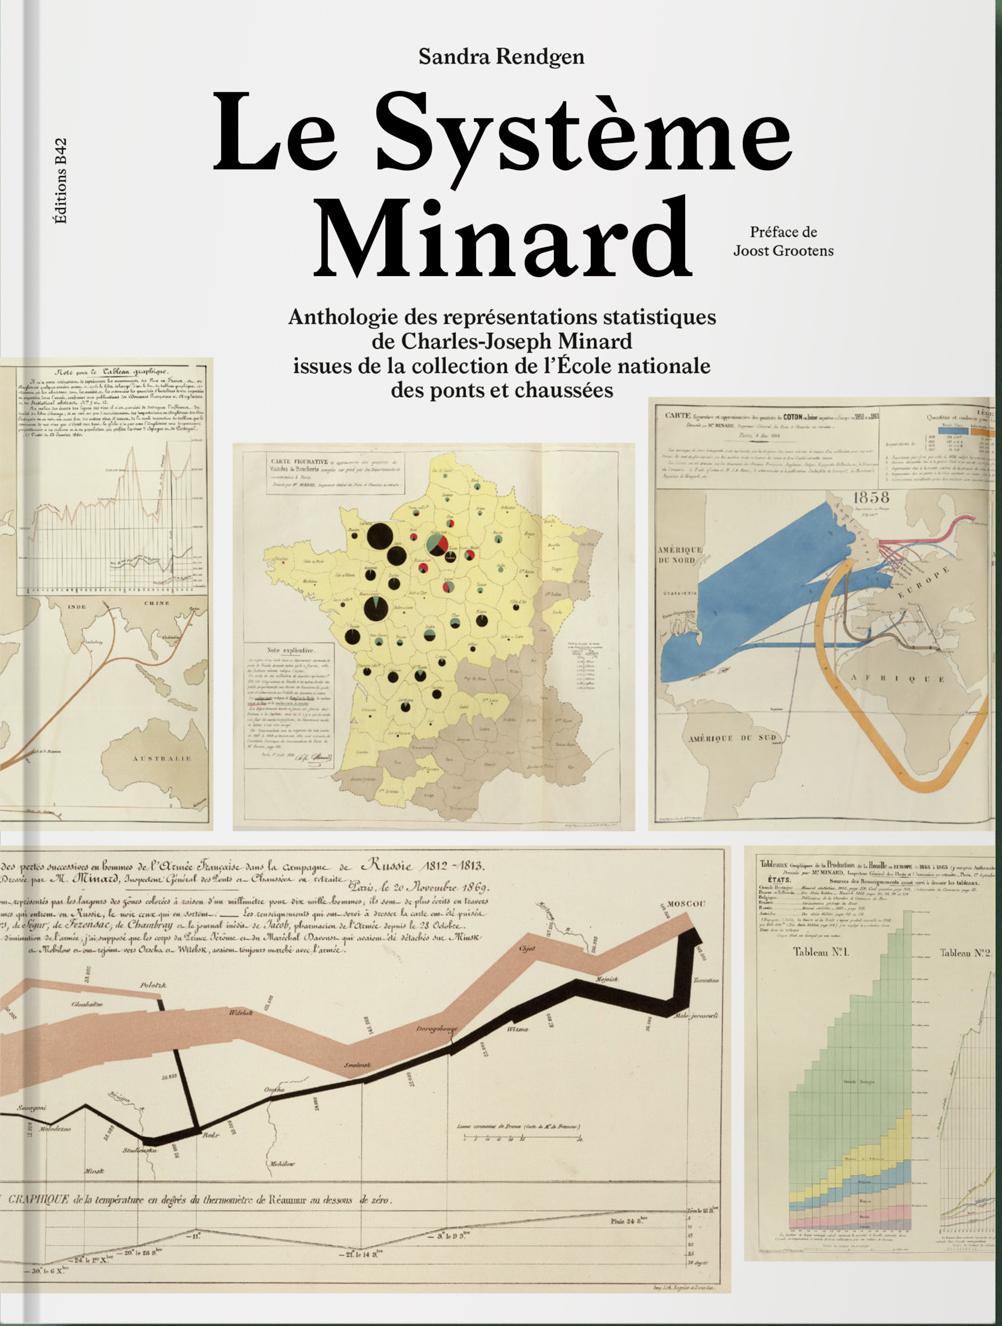 LE SYSTEME MINARD - ANTHOLOGIE DES REPRESENTATIONS STATISTIQUES DE CHARLES-JOSEPH MINARD - ILLUSTRAT